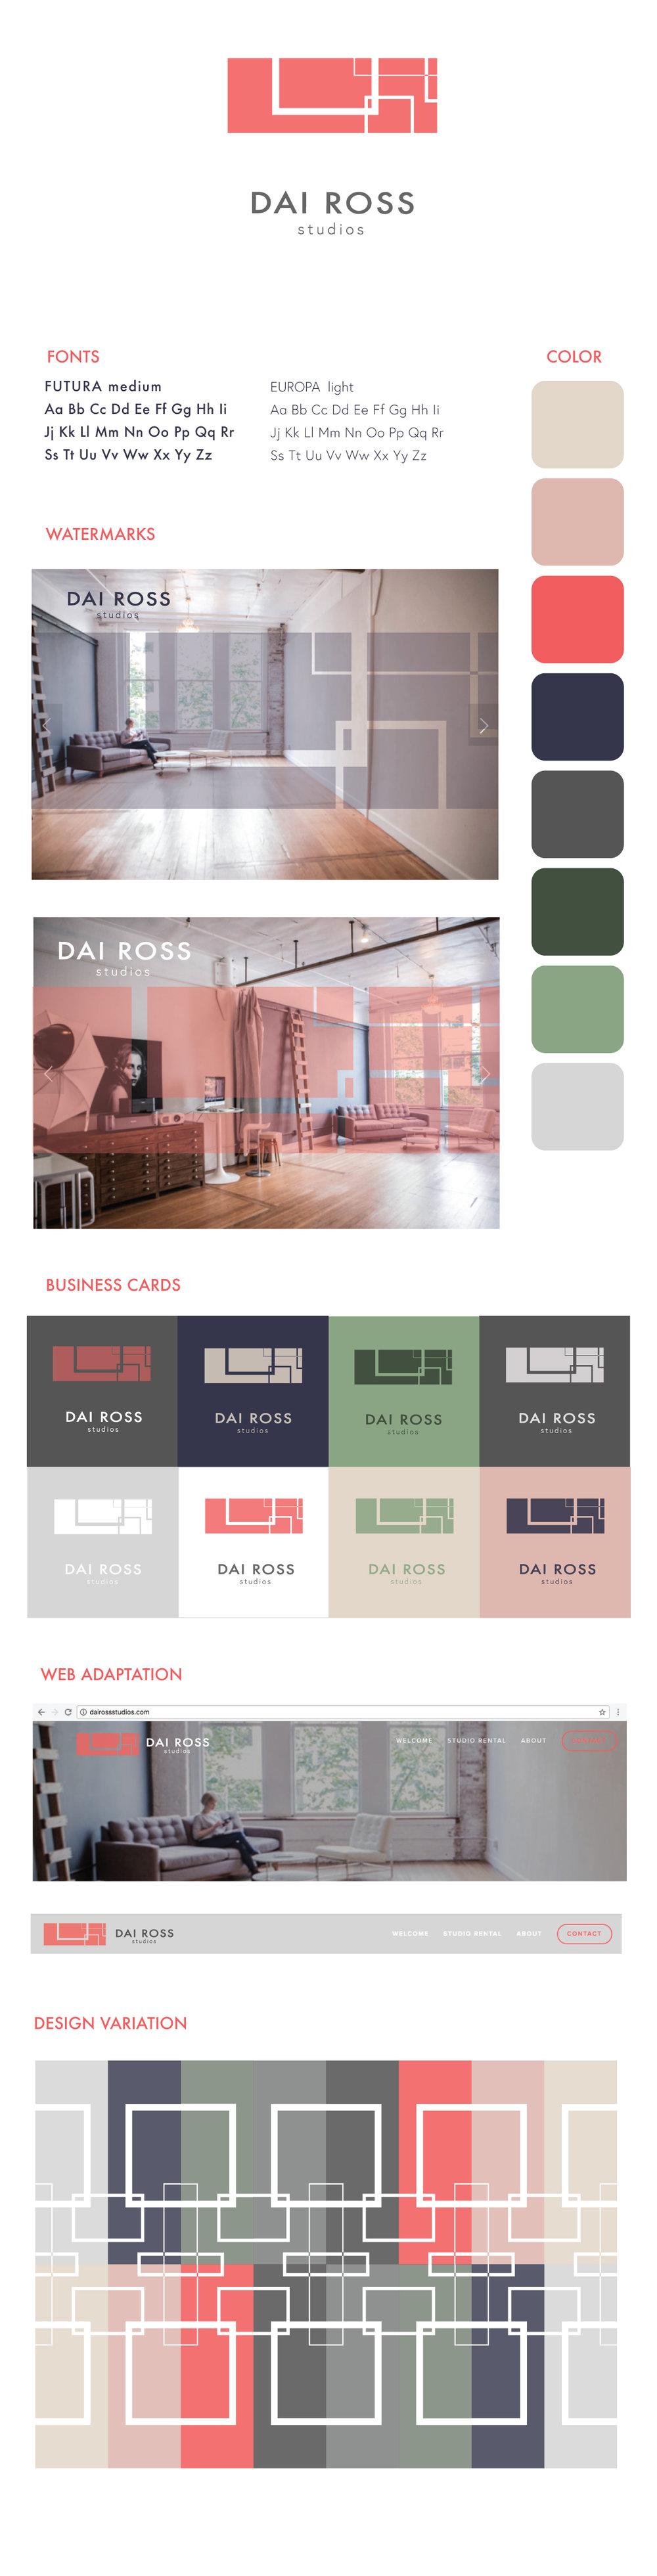 identity-page---daiross.jpg